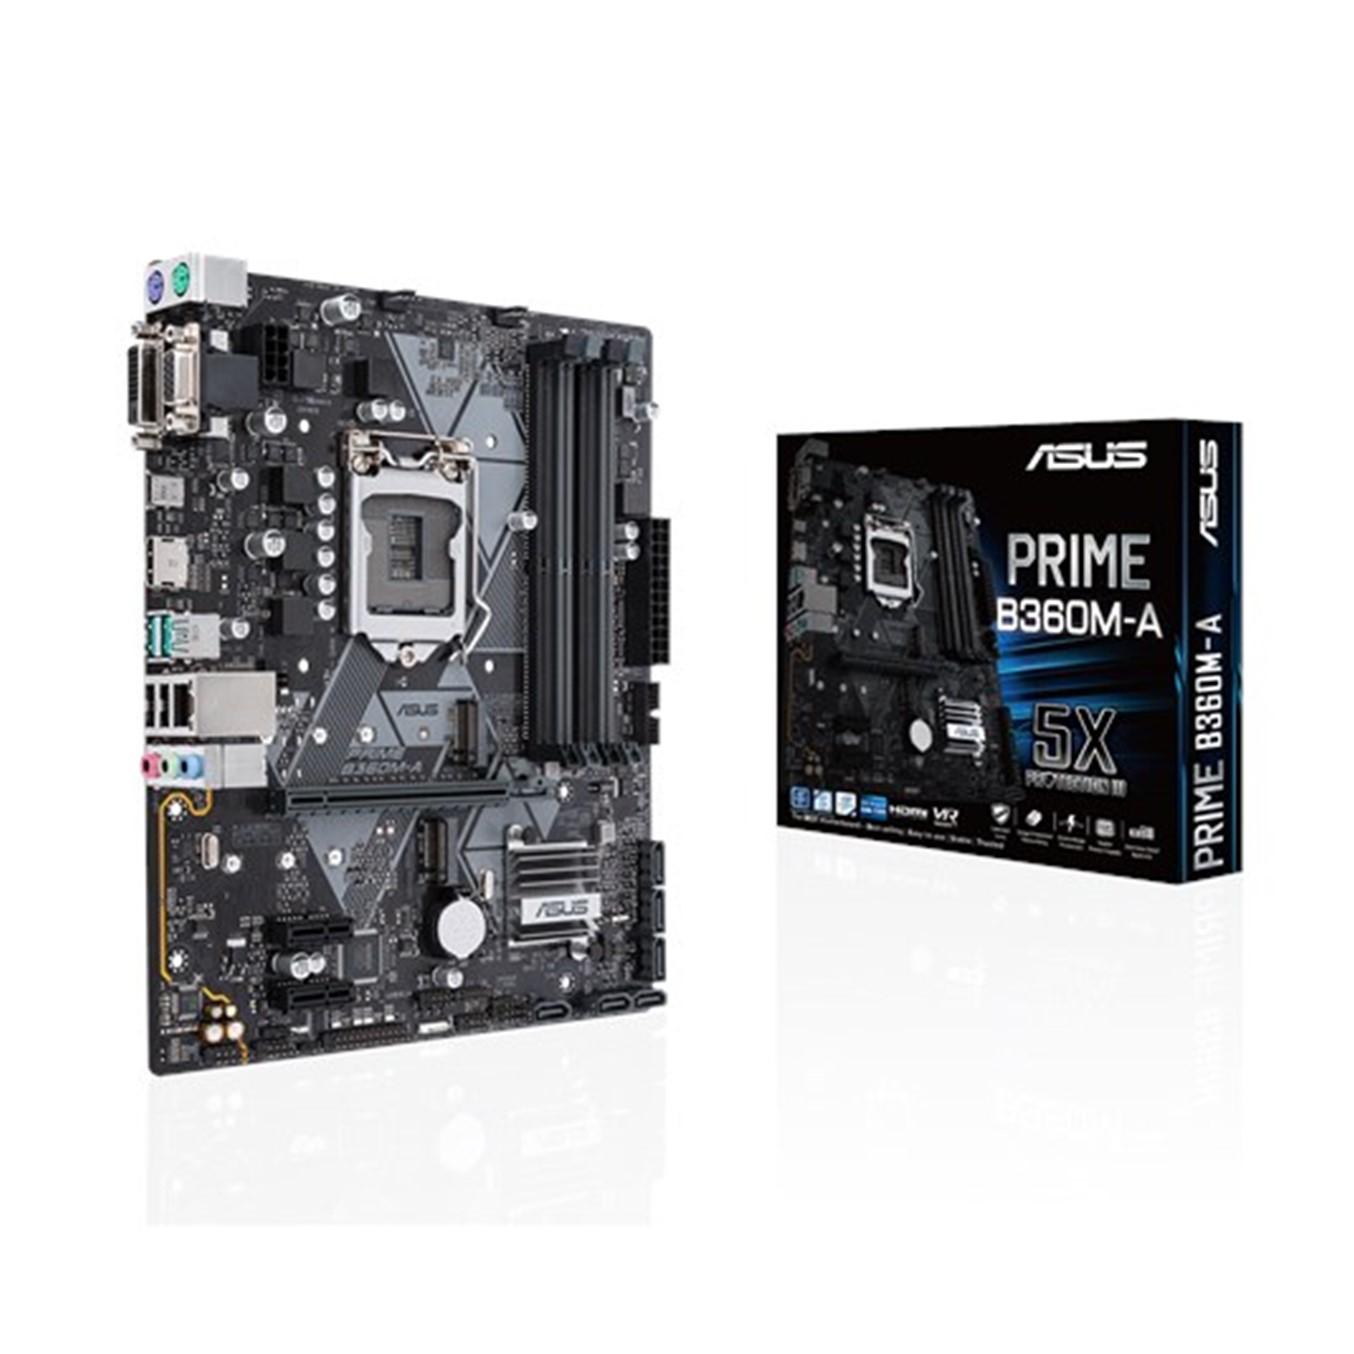 PLACA BASE ASUS INTEL PRIME-B360M-A SOCKET 1151 DDR4